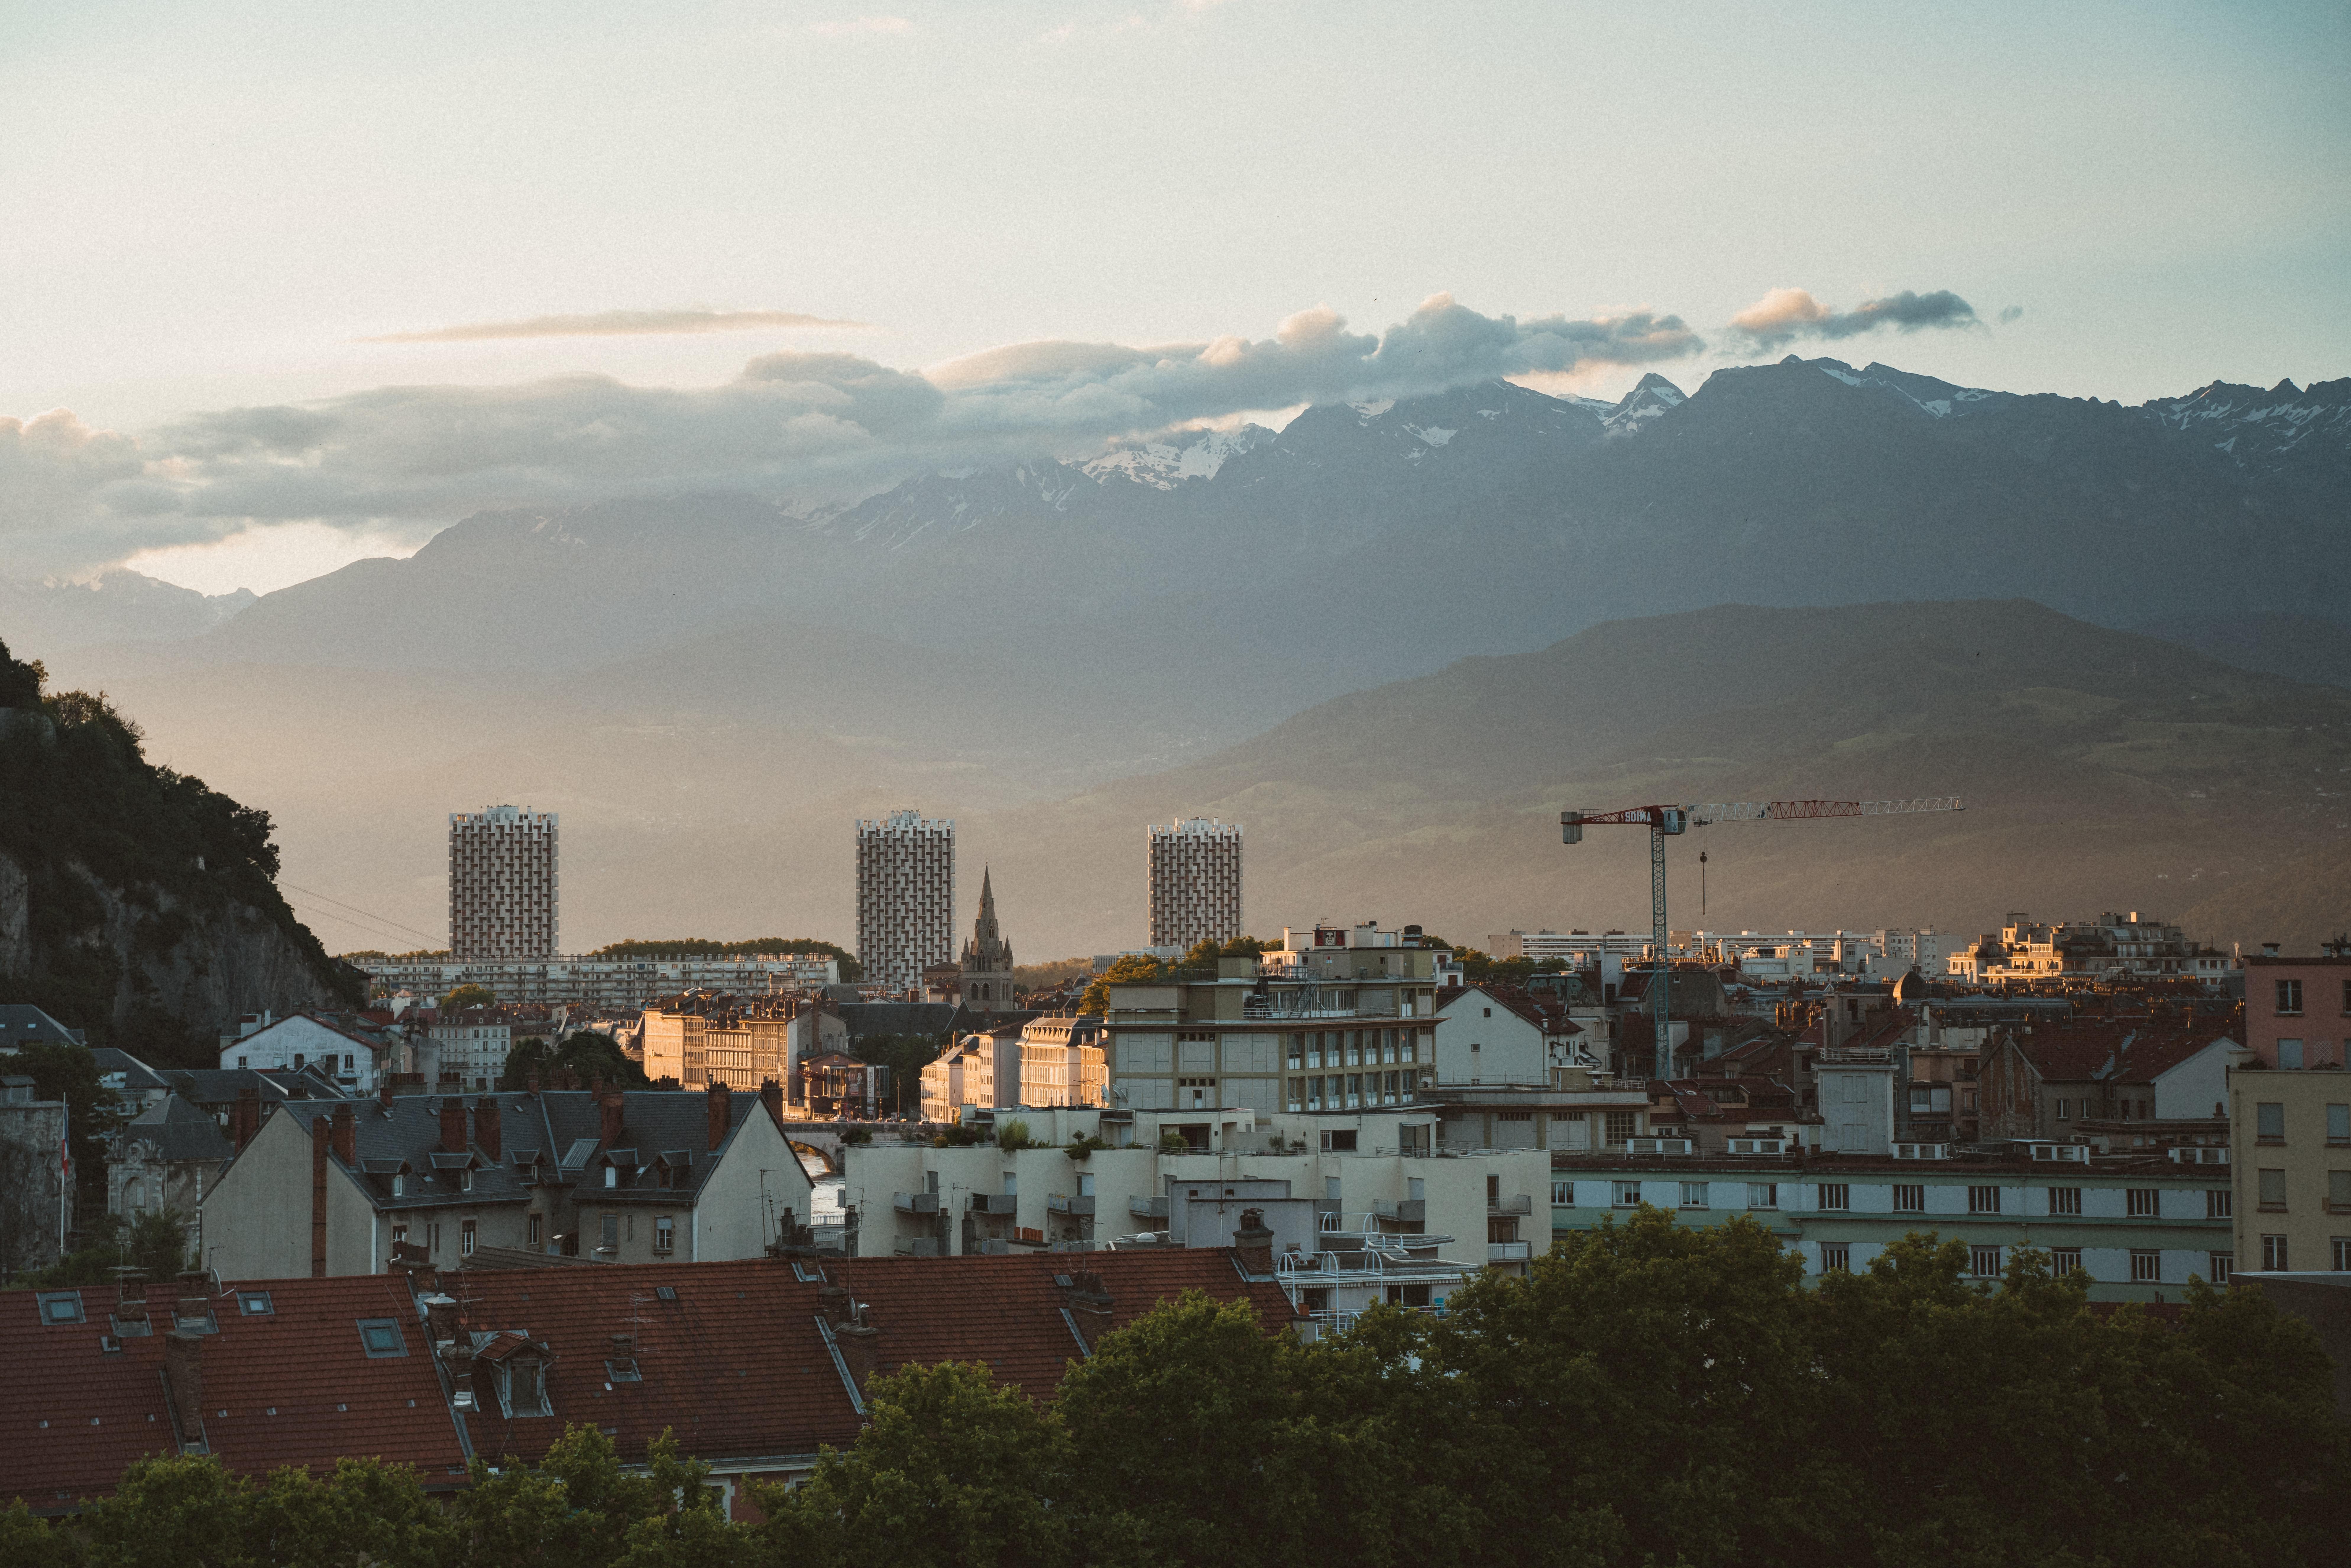 Grenoble élue Capitale verte européenne 2022